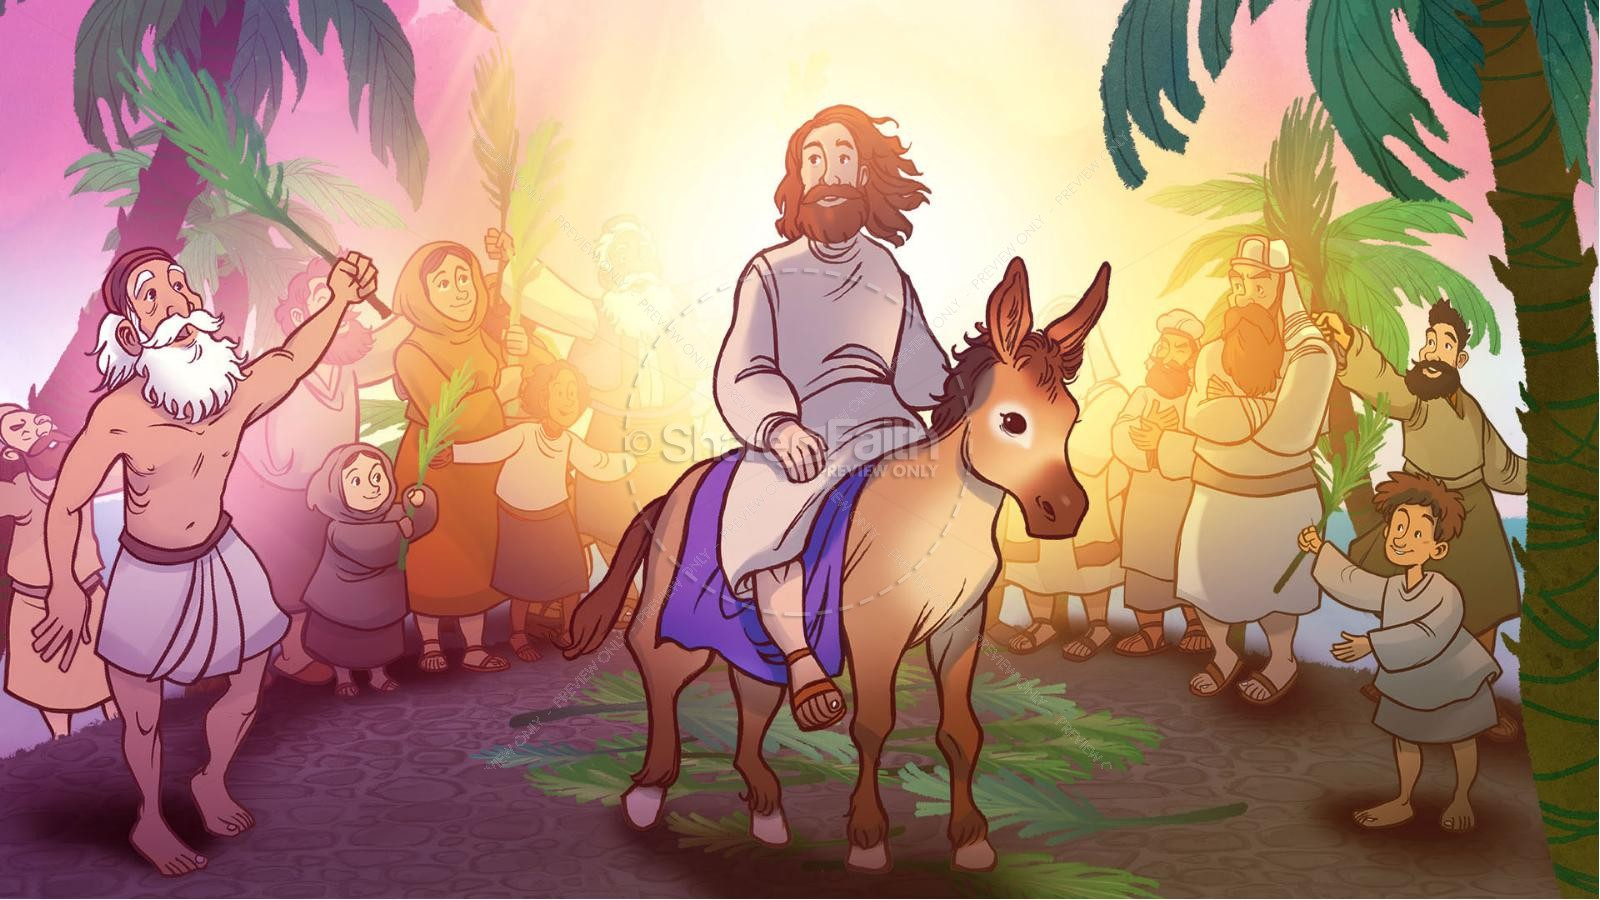 Luke 19 The Triumphal Entry Kids Bible Story | slide 6